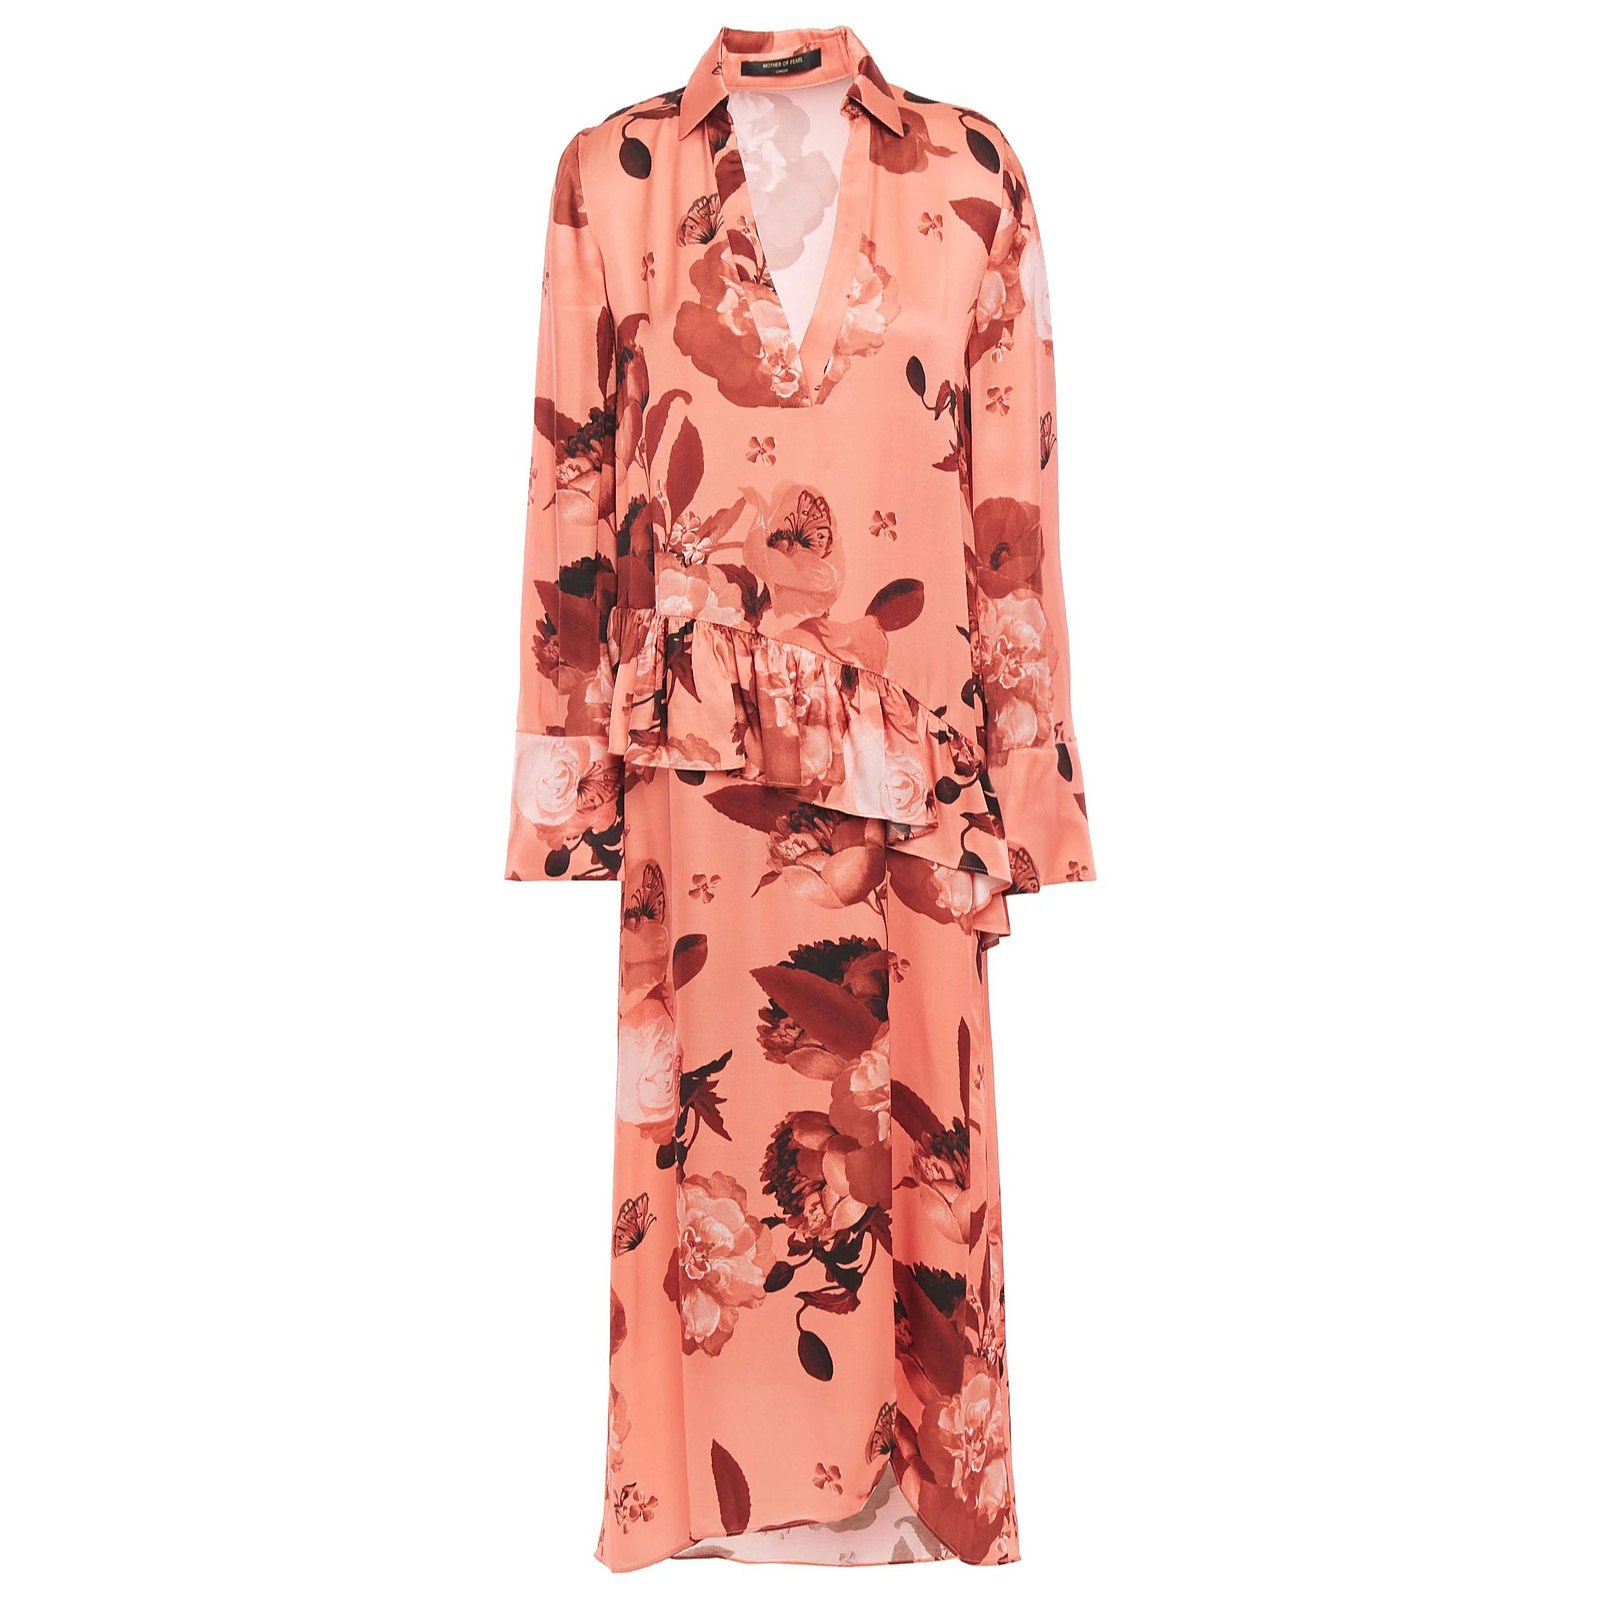 Mother of Pearl Alba Floral-Print Satin Midi Dress